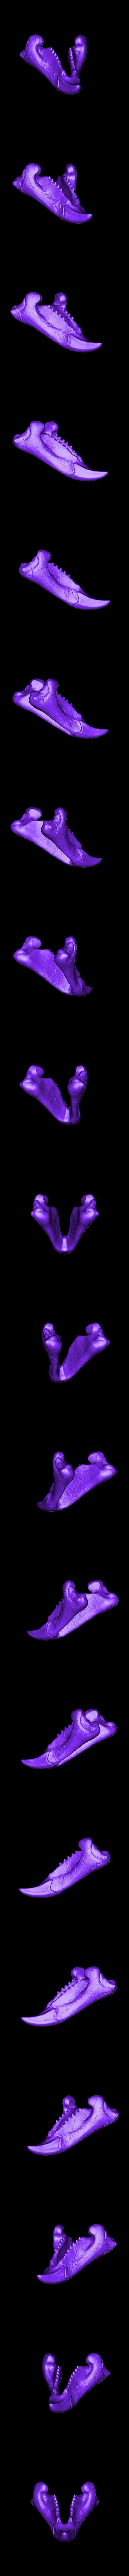 Triceratops_Skull_2.obj Download free OBJ file Triceratops Skull • 3D printable model, Dynastinae